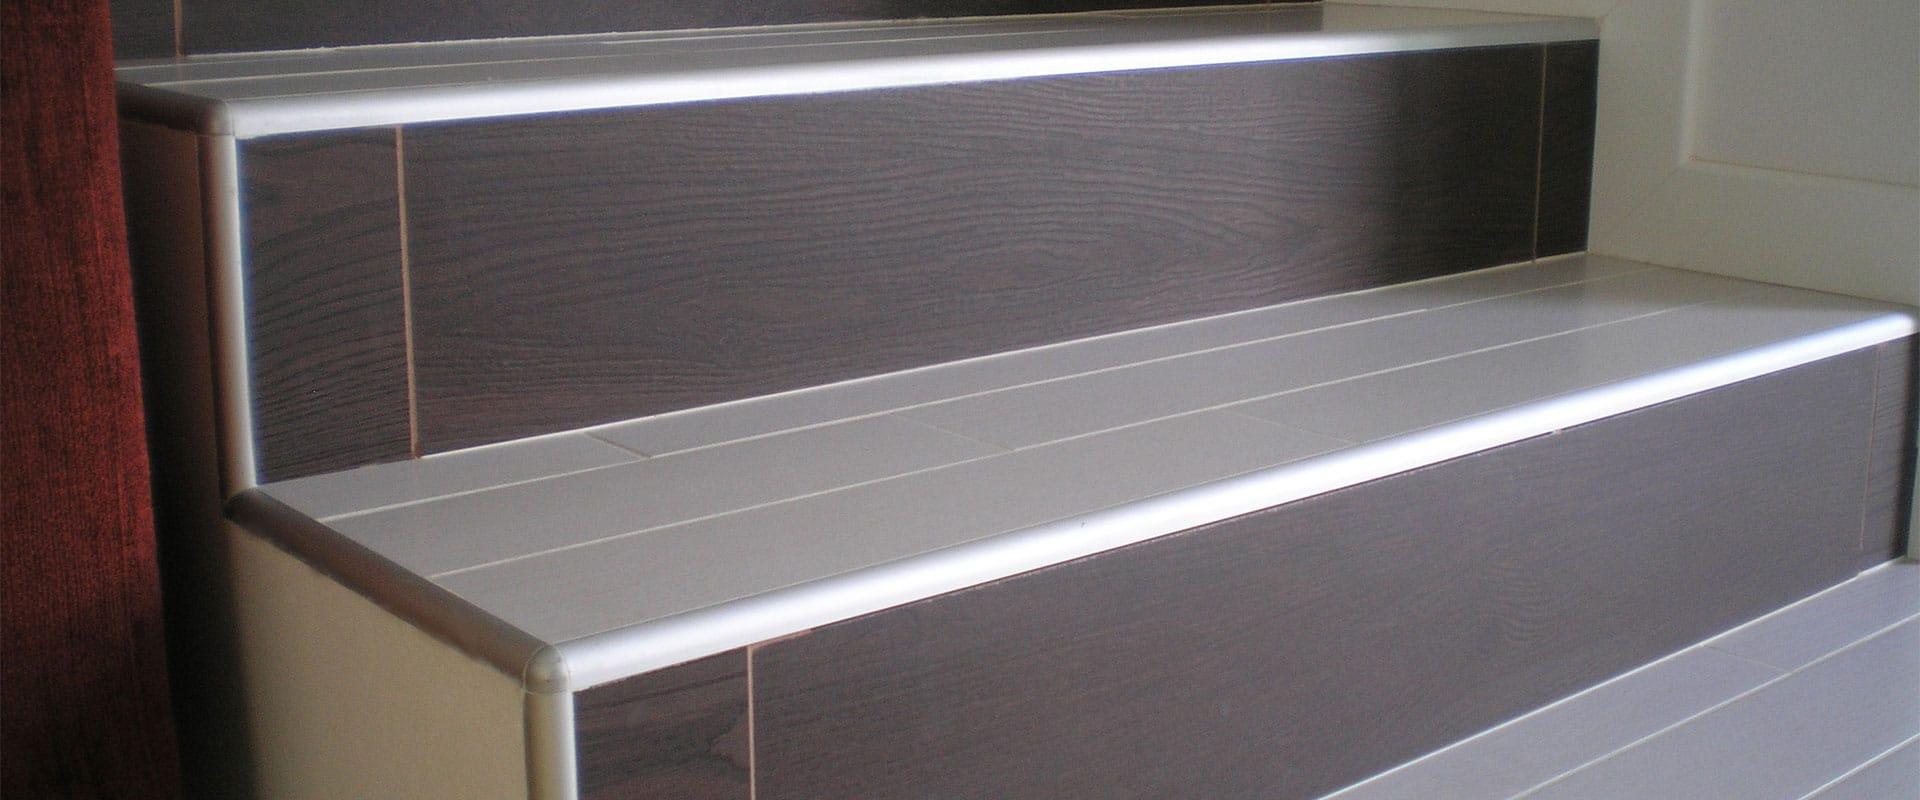 Metope pavimenti 16 metope superfici e finiture d 39 arredo - Arredo bagno montebelluna ...